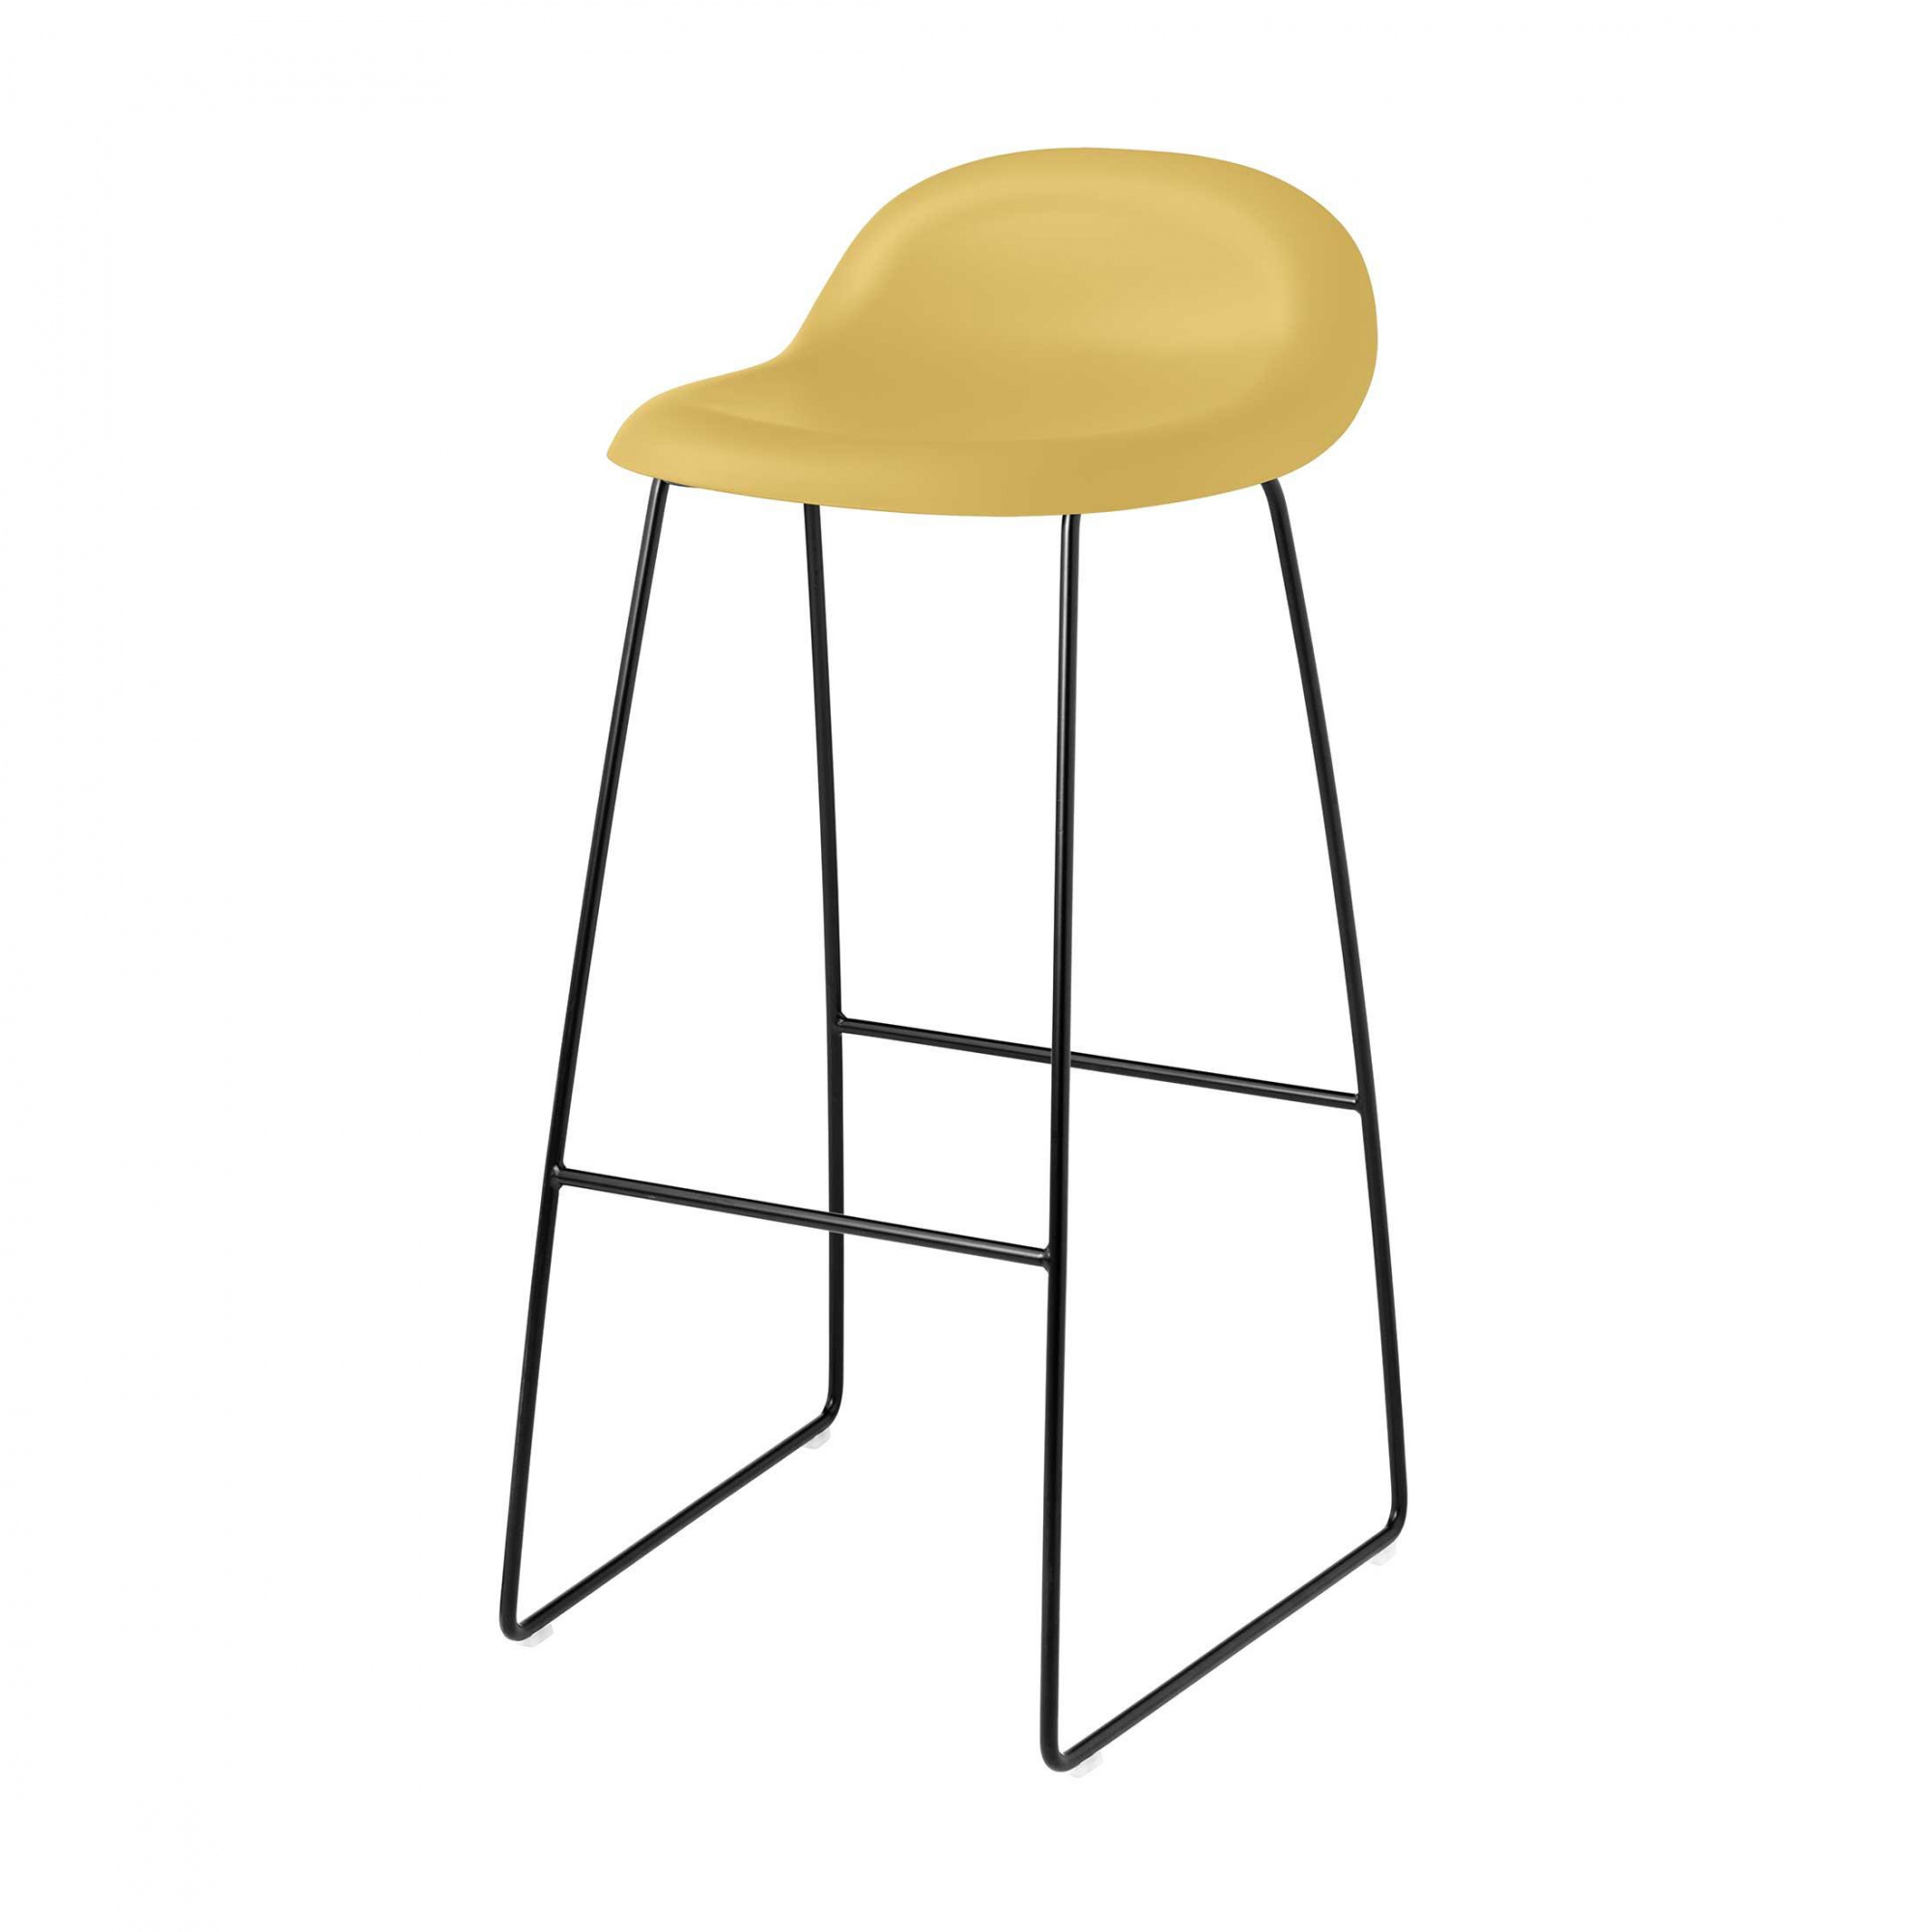 Gubi - 3D Bar Stool 75cm Kufengestell schwarz - gold venezianisch/Sitzfläche HiRek Kunststoff/BxHxT 44x88x45cm/Gestell schwarz/Kunststoffgleiter   Küche und Esszimmer > Bar-Möbel   Gubi